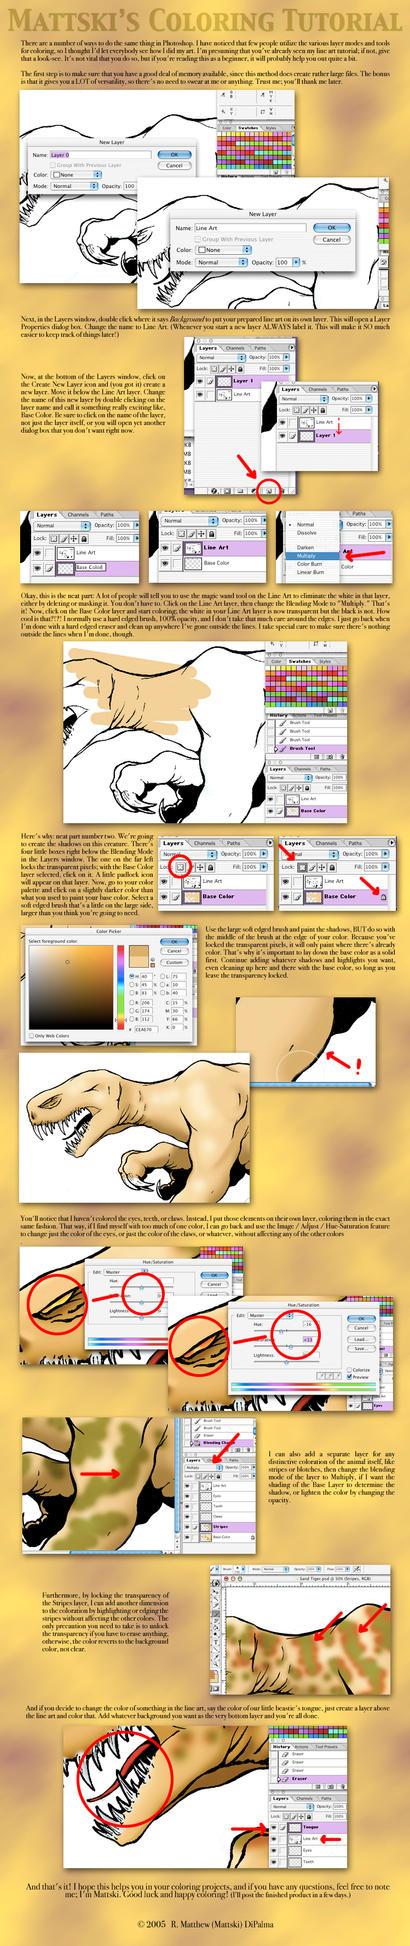 Digital painting lineart on photoshop tutorials deviantart mattski 28 5 coloring tutorial by mattski baditri Images